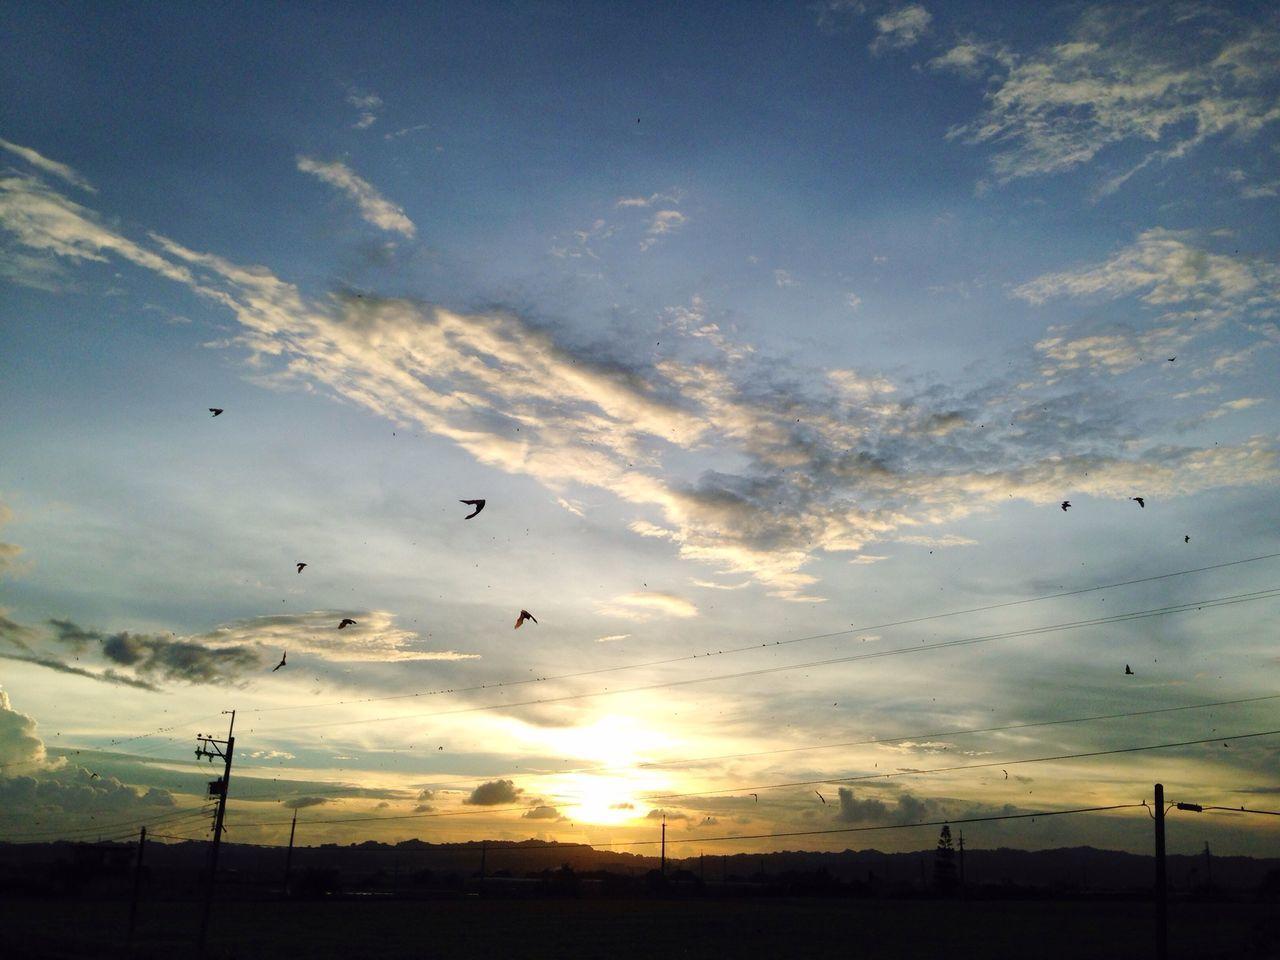 黑暗騎士出沒 Clouds And Sky Sunset Bat